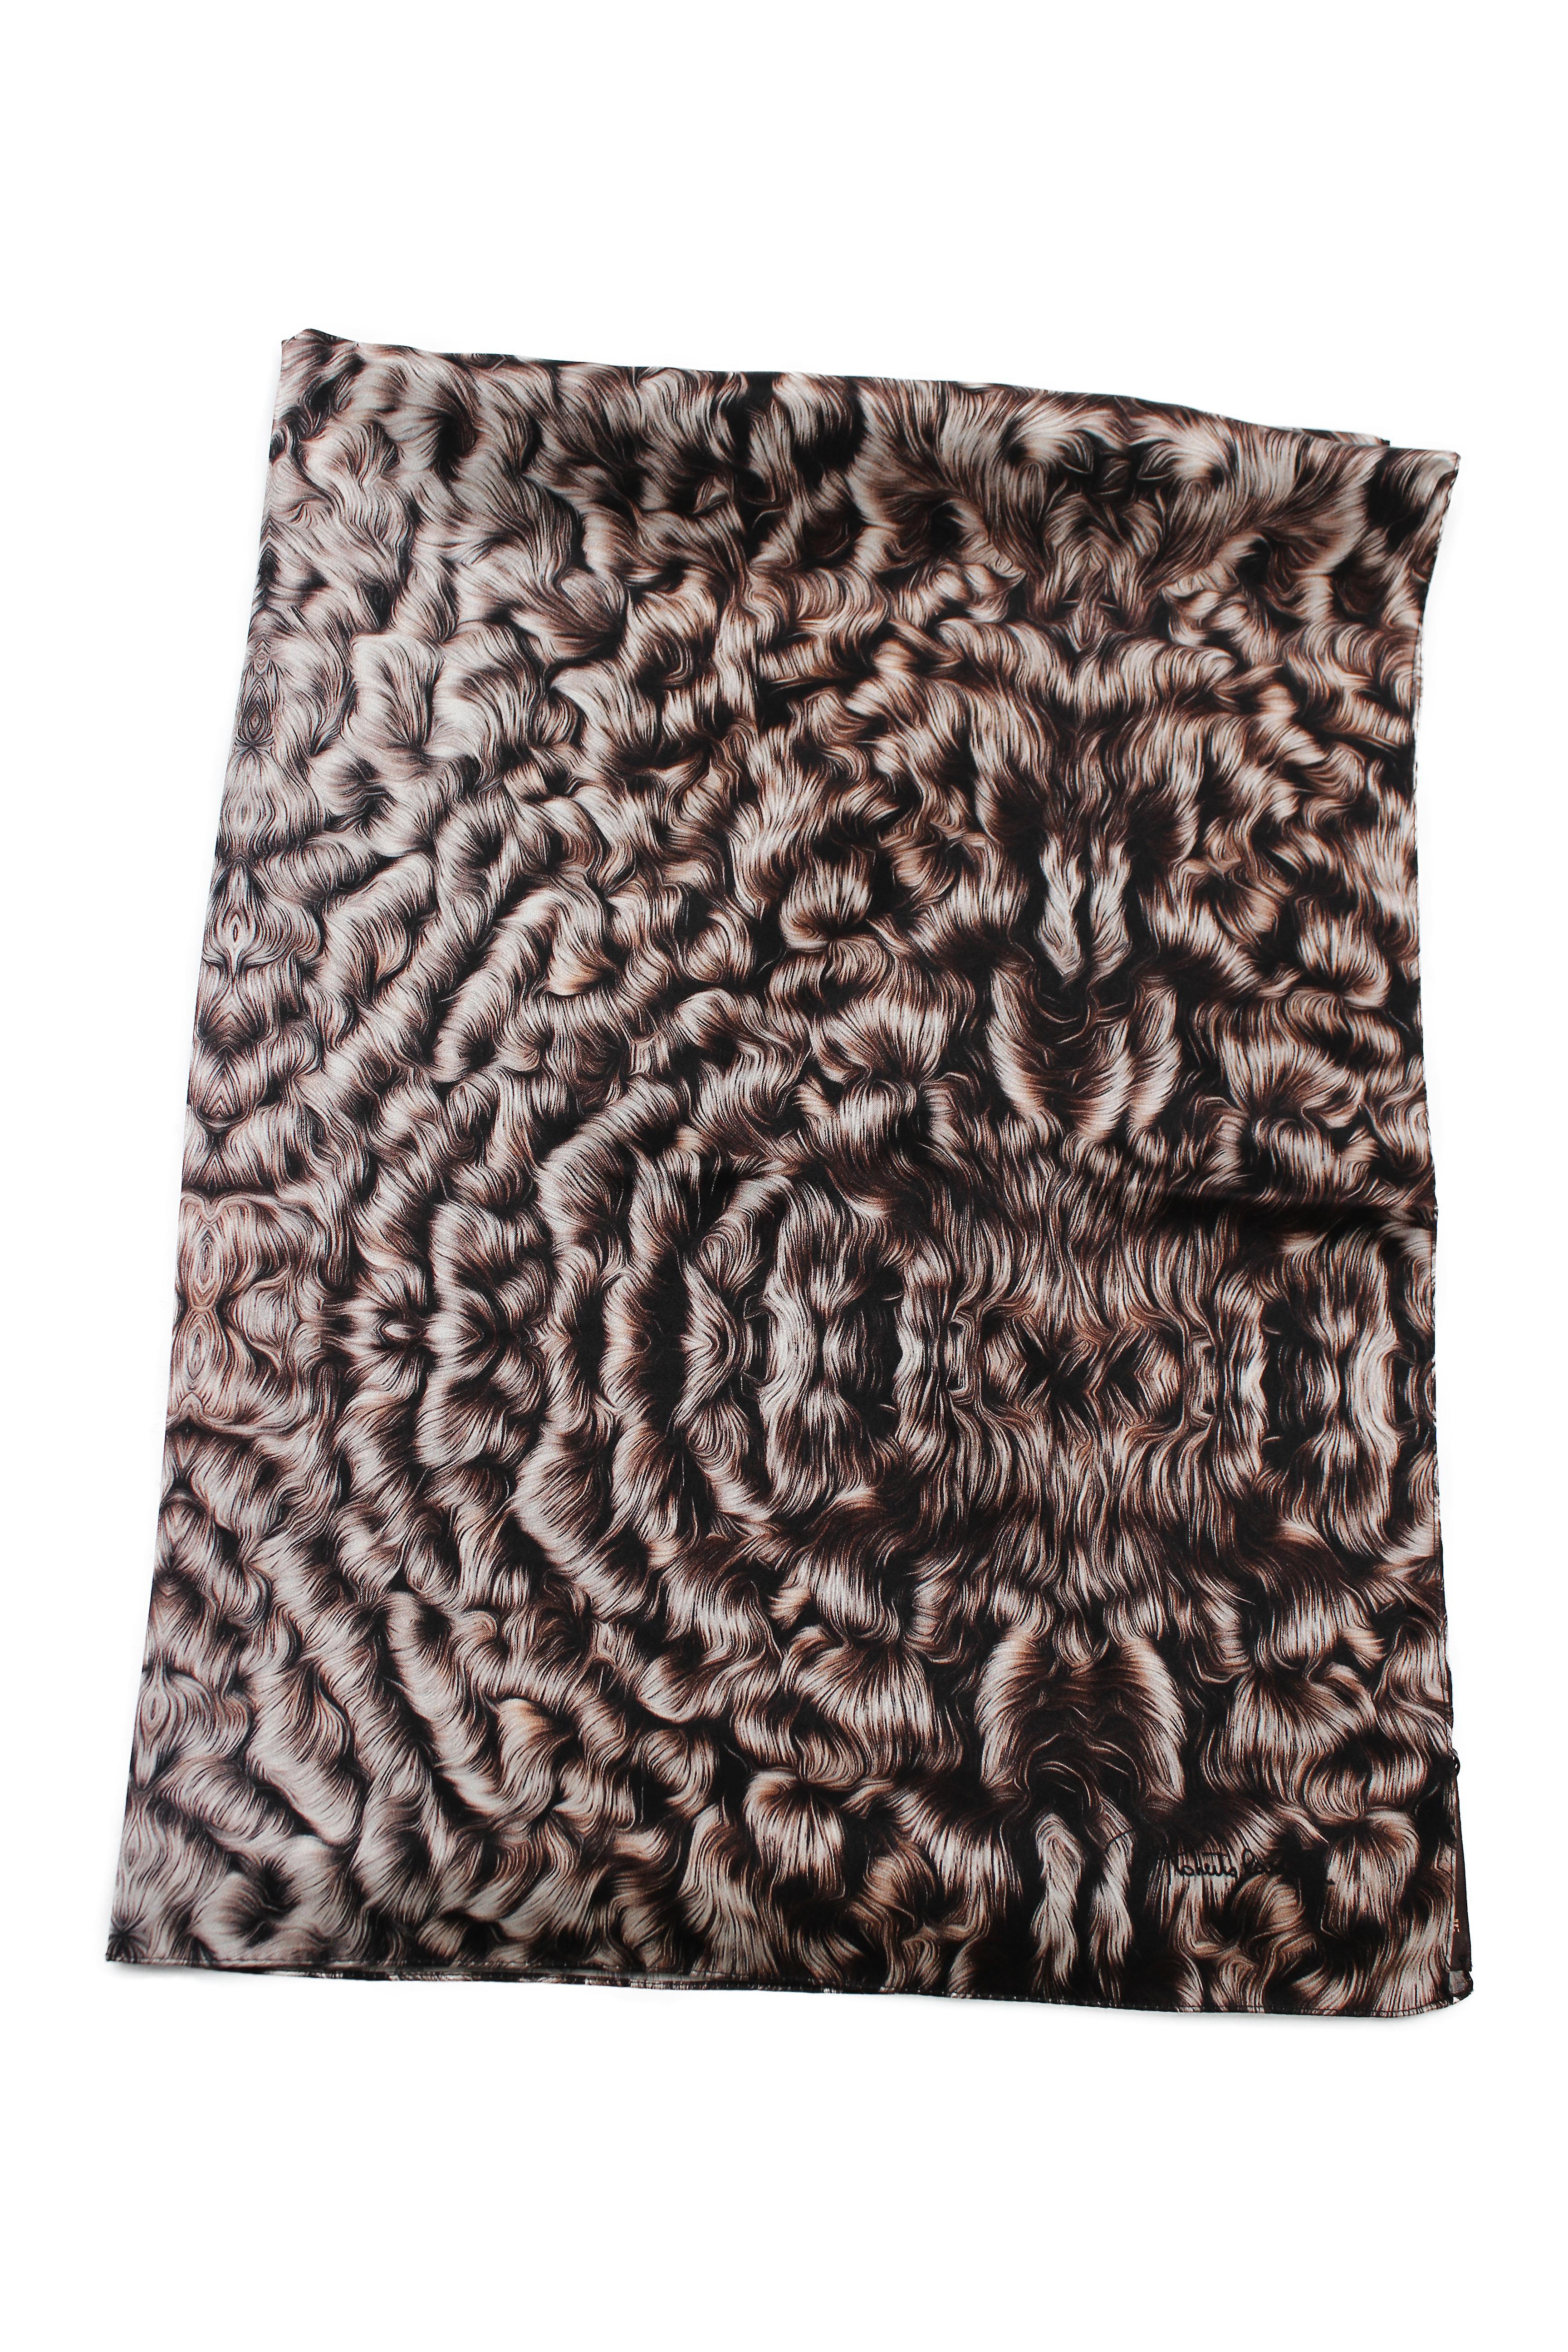 Roberto Cavalli Silk Scarf Patterned Scarf,  White Black  Print Details